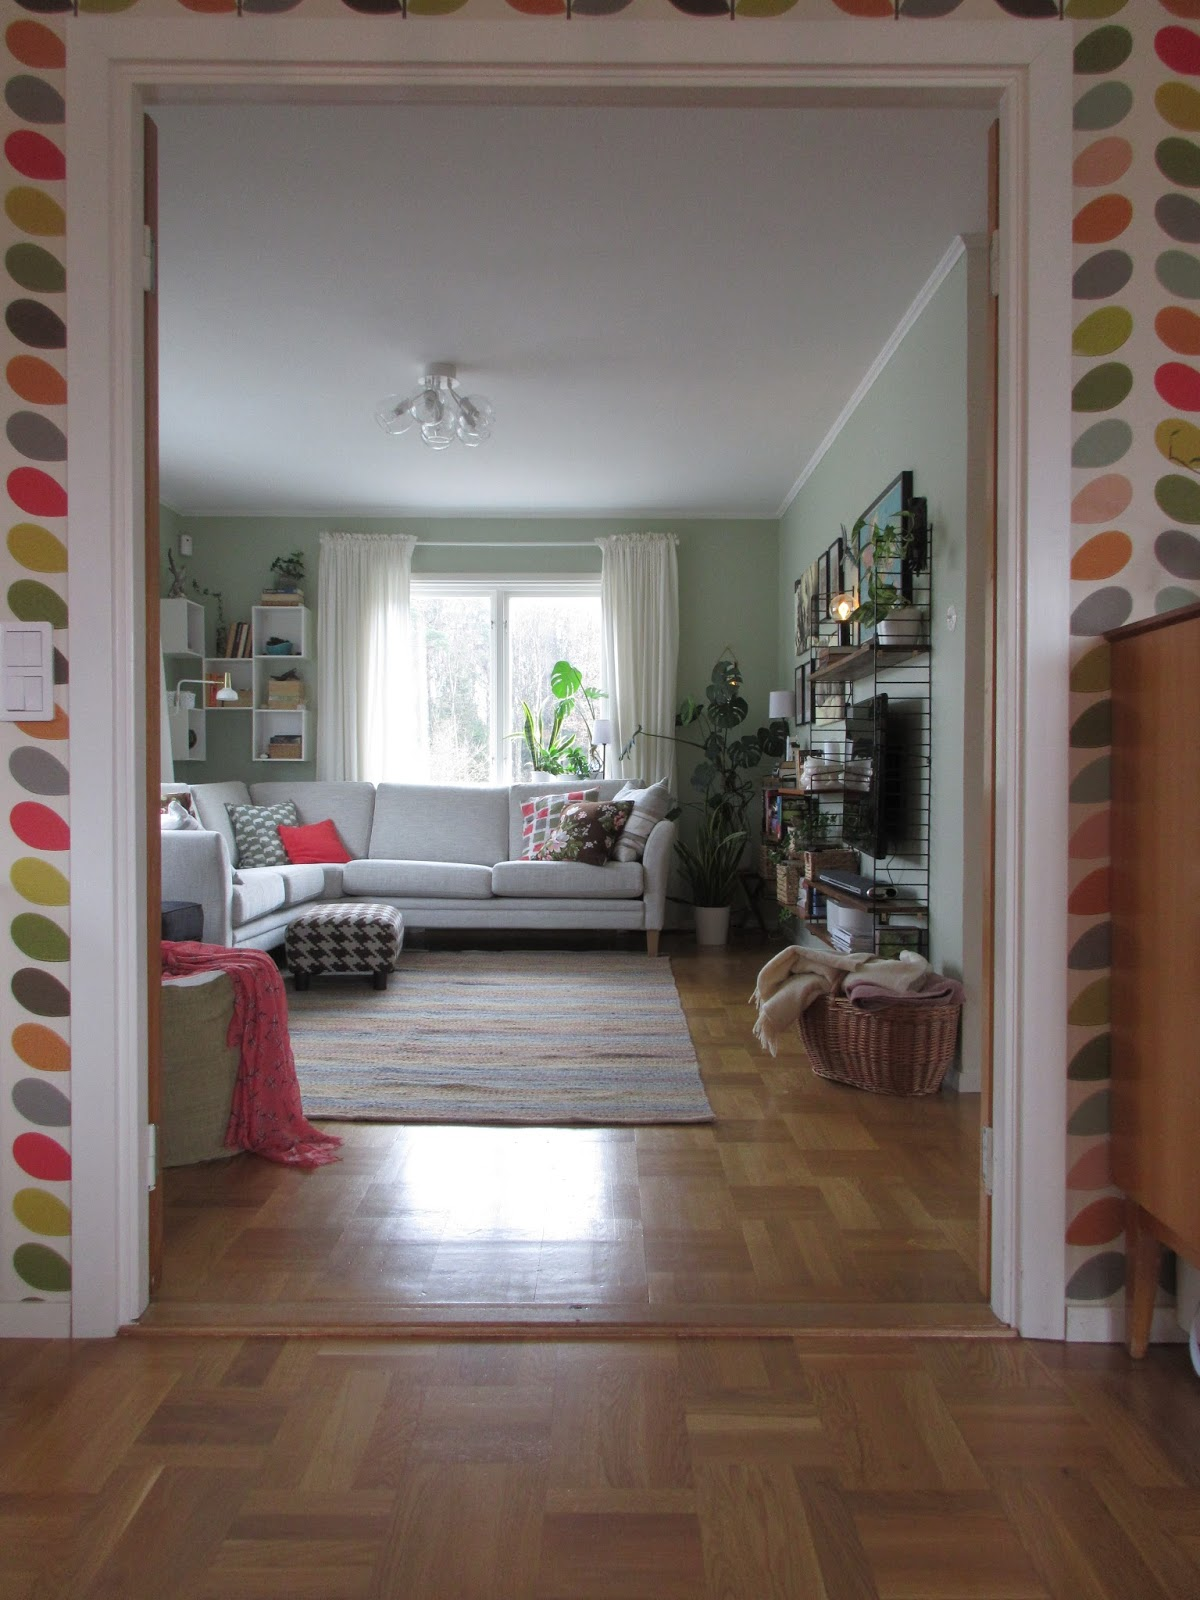 Pias planer: vardagsrum klart!